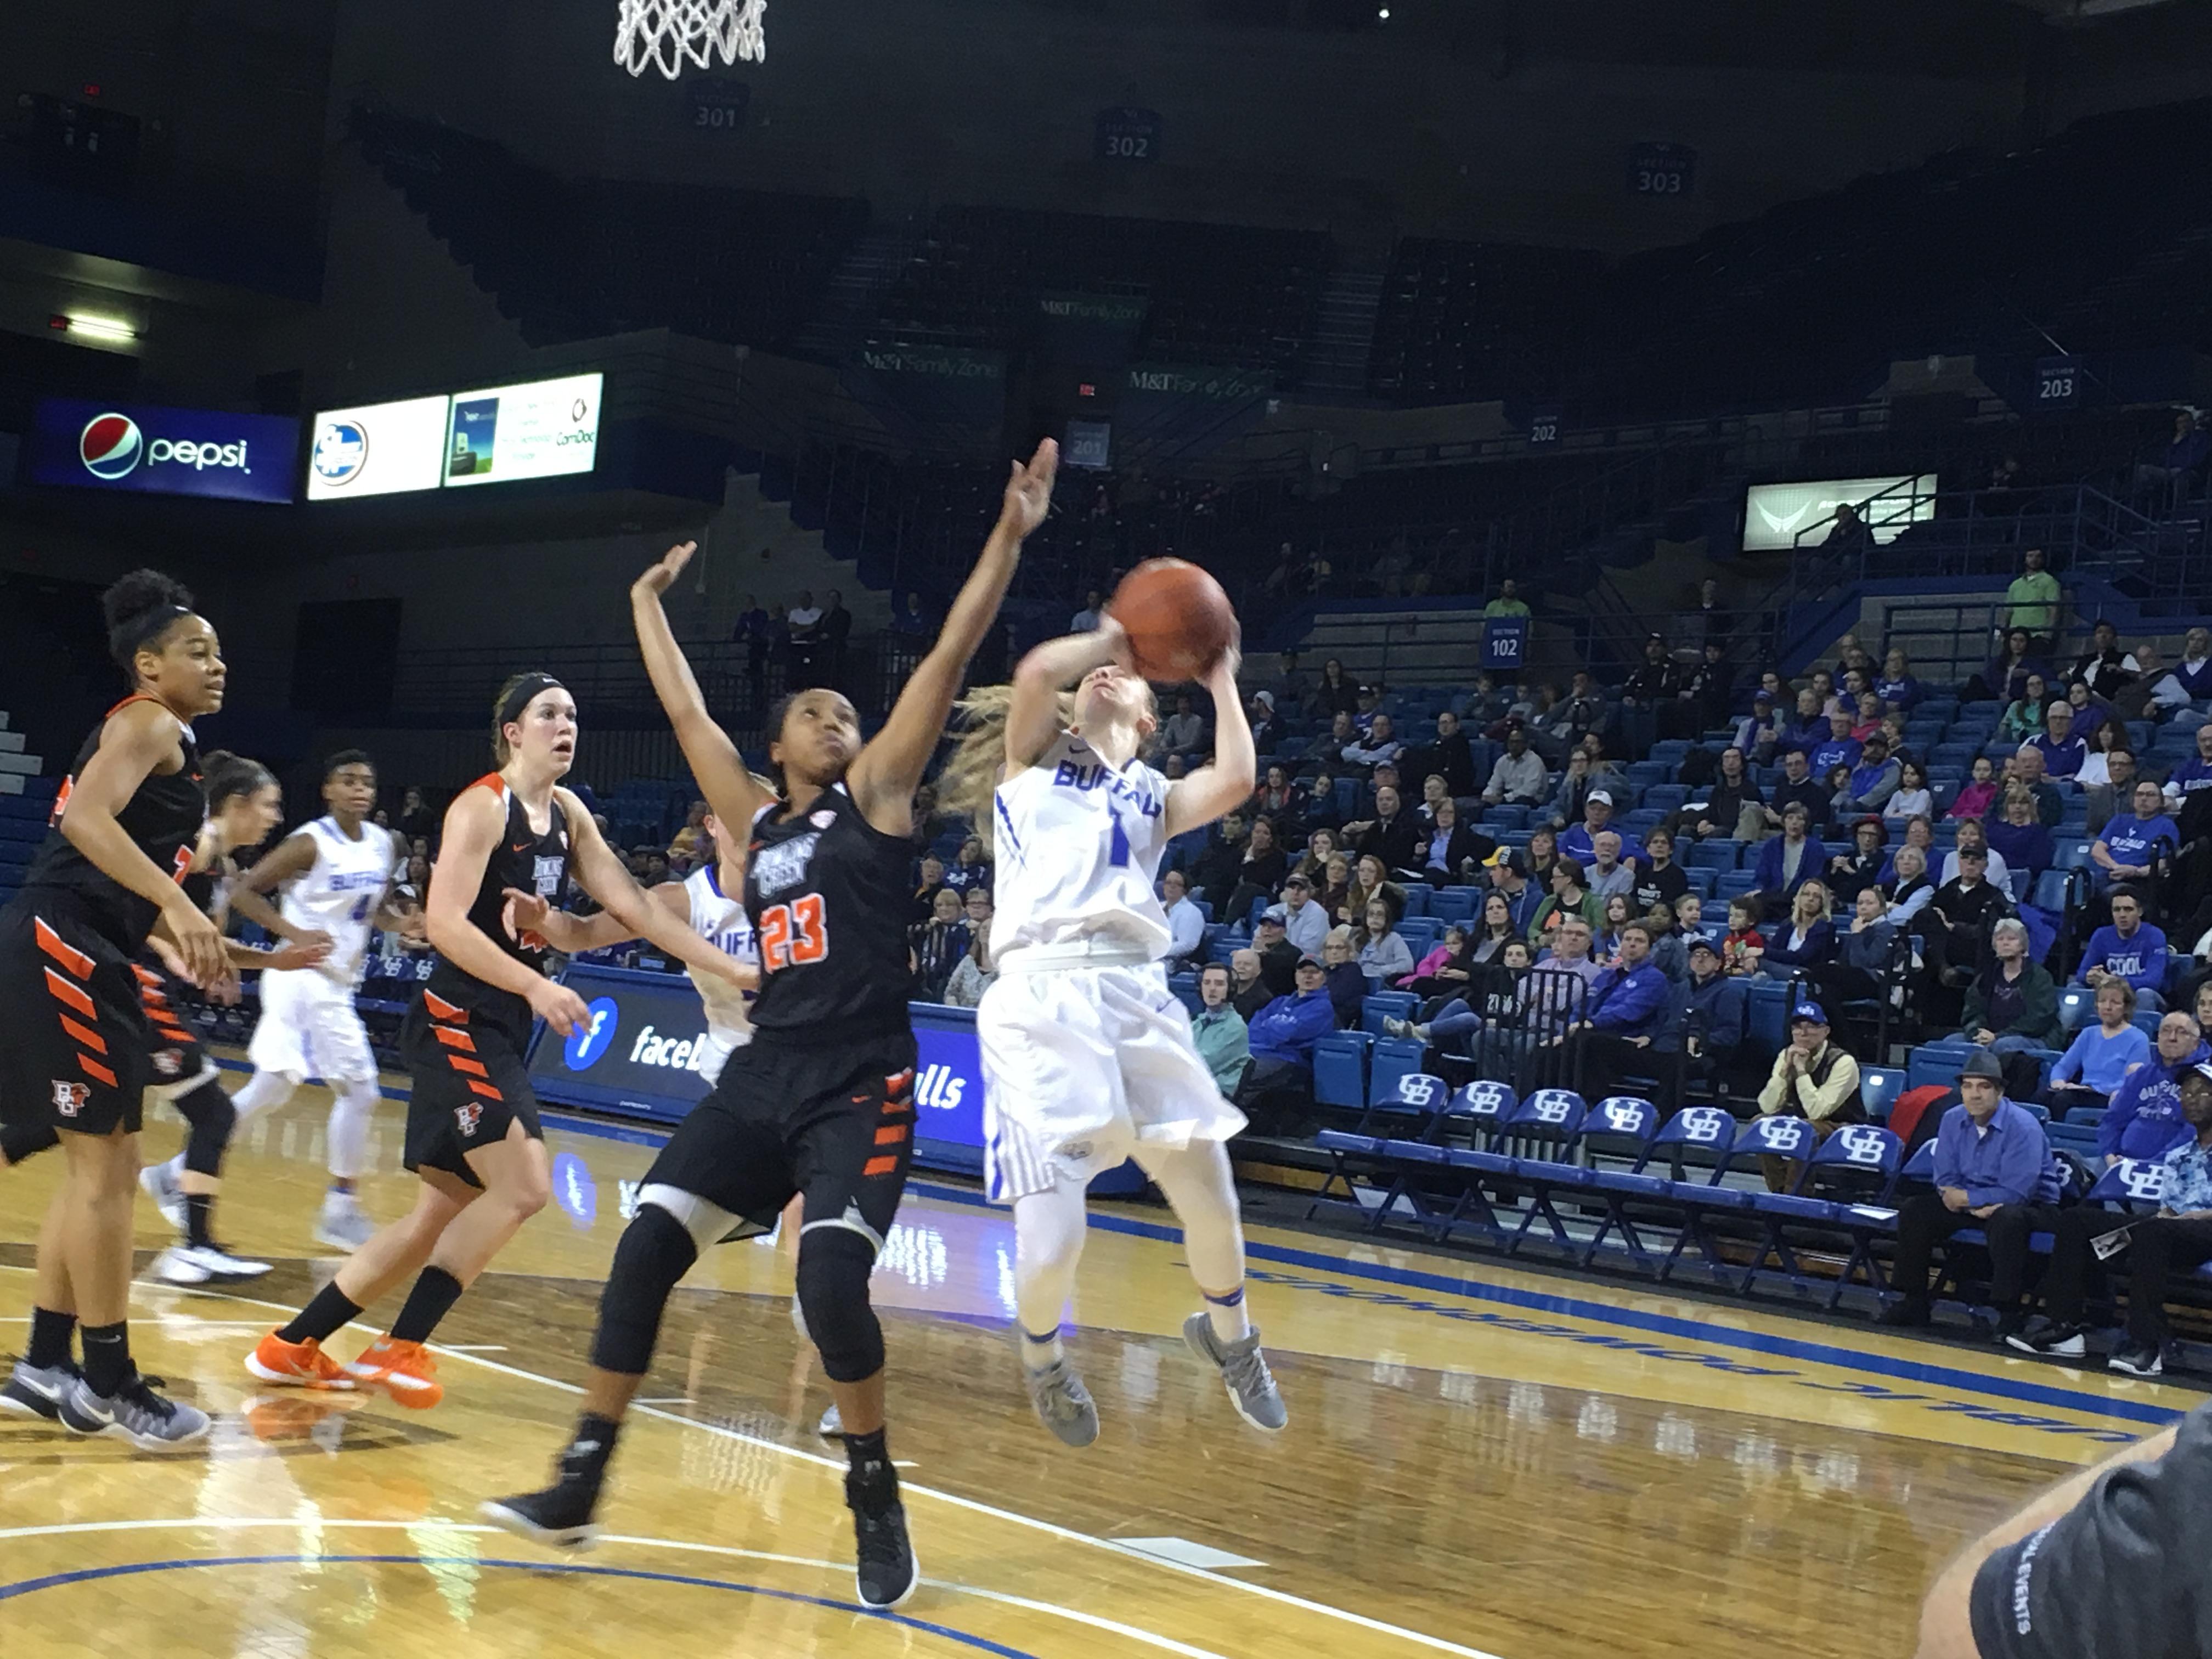 UB's Stephanie Reid drives, scores and gets fouled Monday vs. Bowling Green. (Buffalo News)